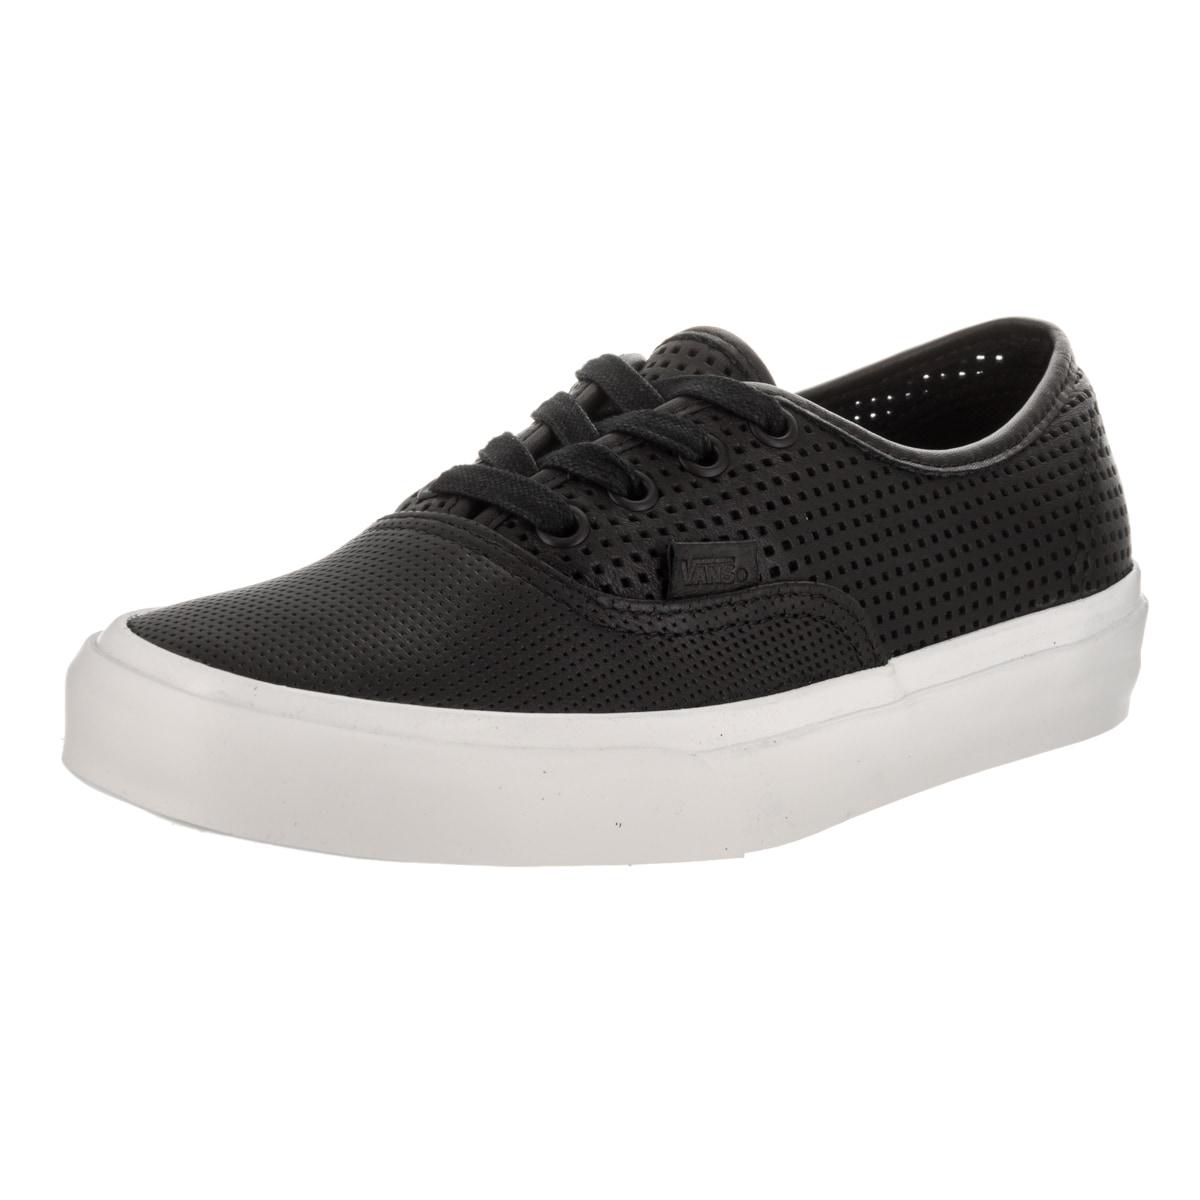 f89e15e4a5 Shop Vans Unisex Authentic Dx Square Perferated Skate Shoes - Free ...